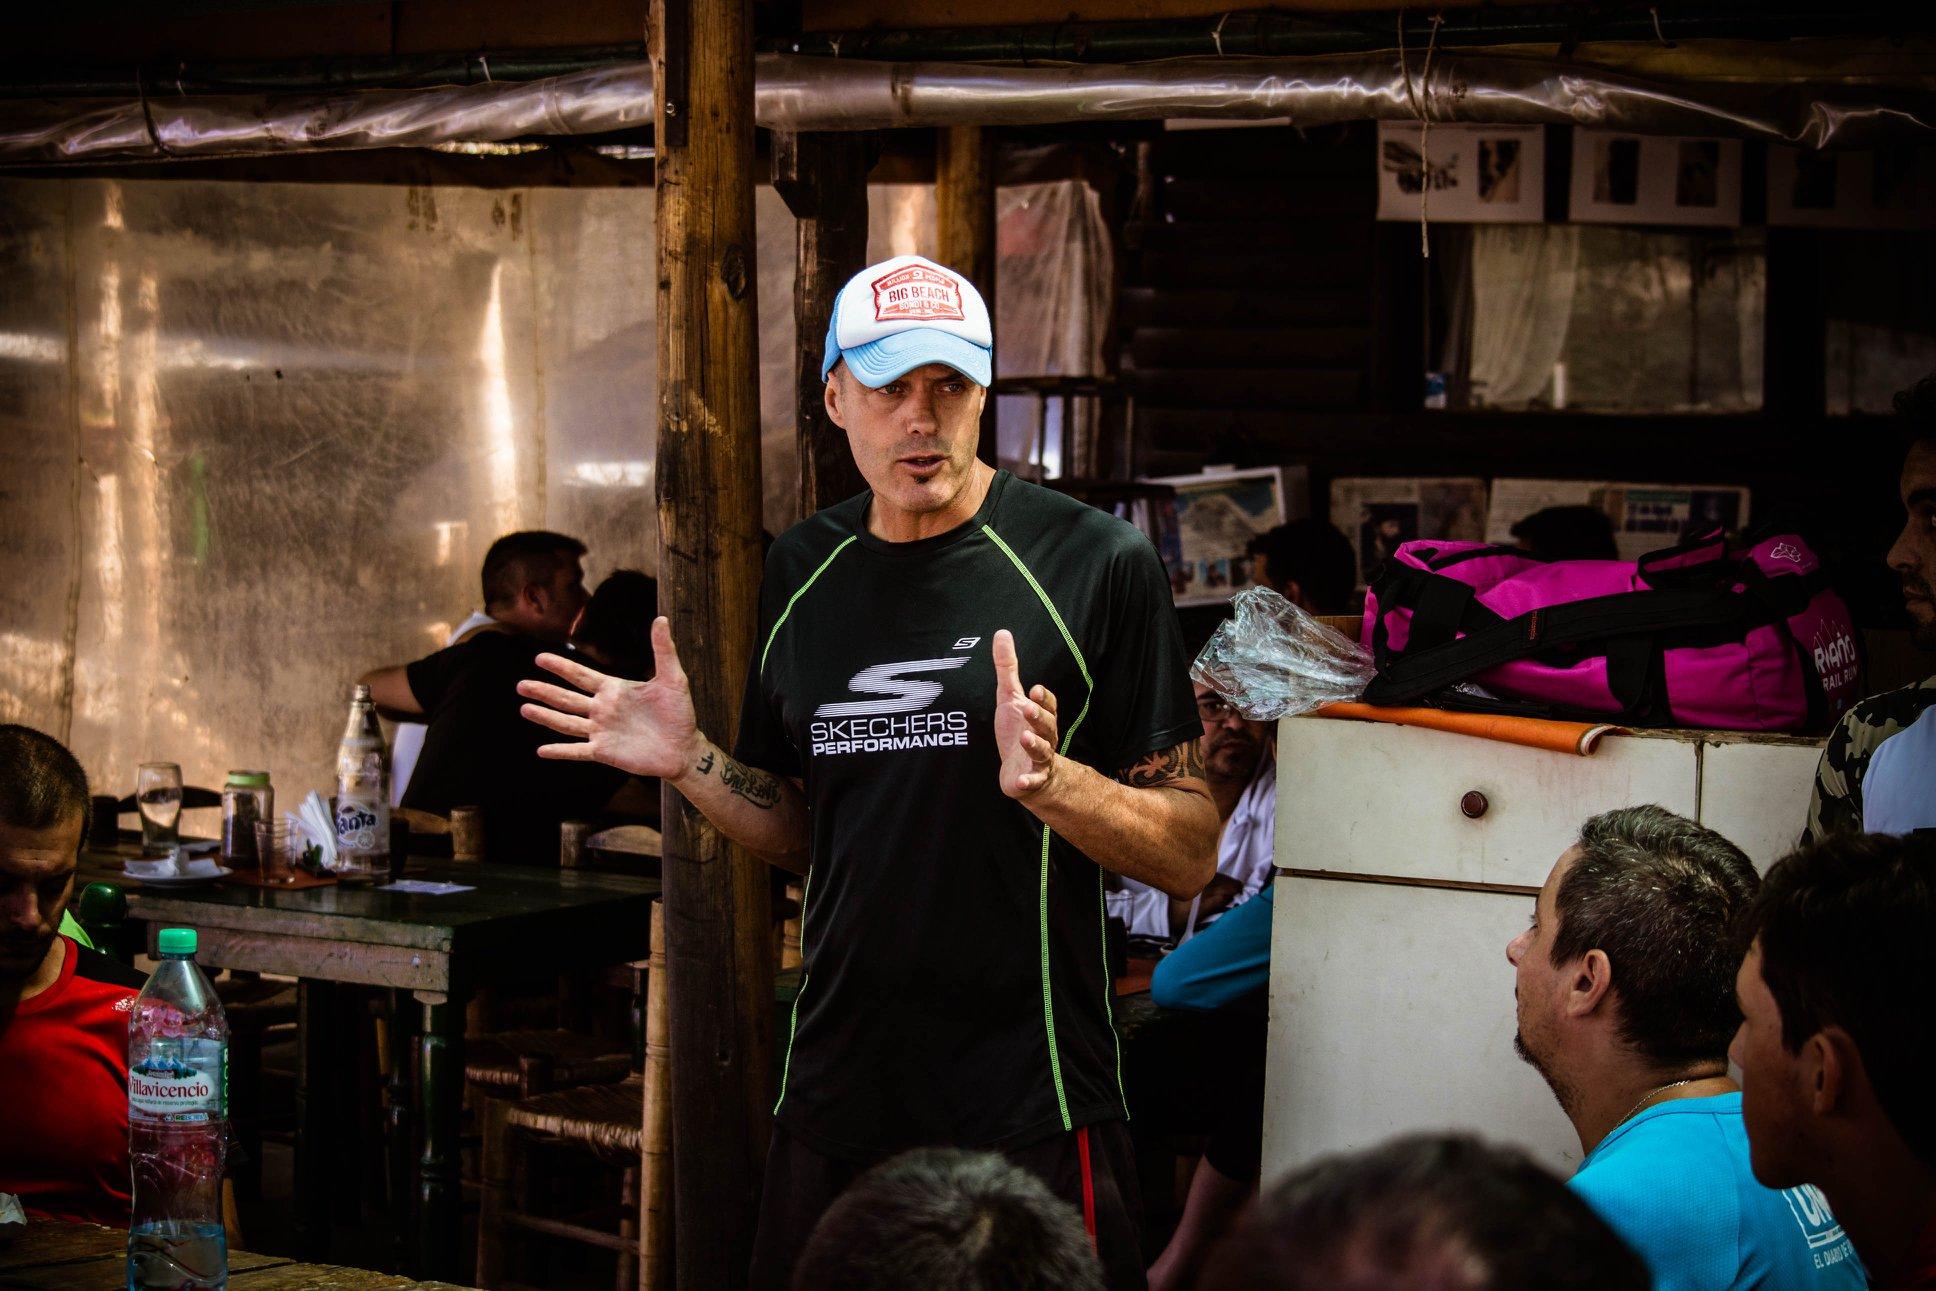 Diego Winitzky Running Trip Locos Por Correr